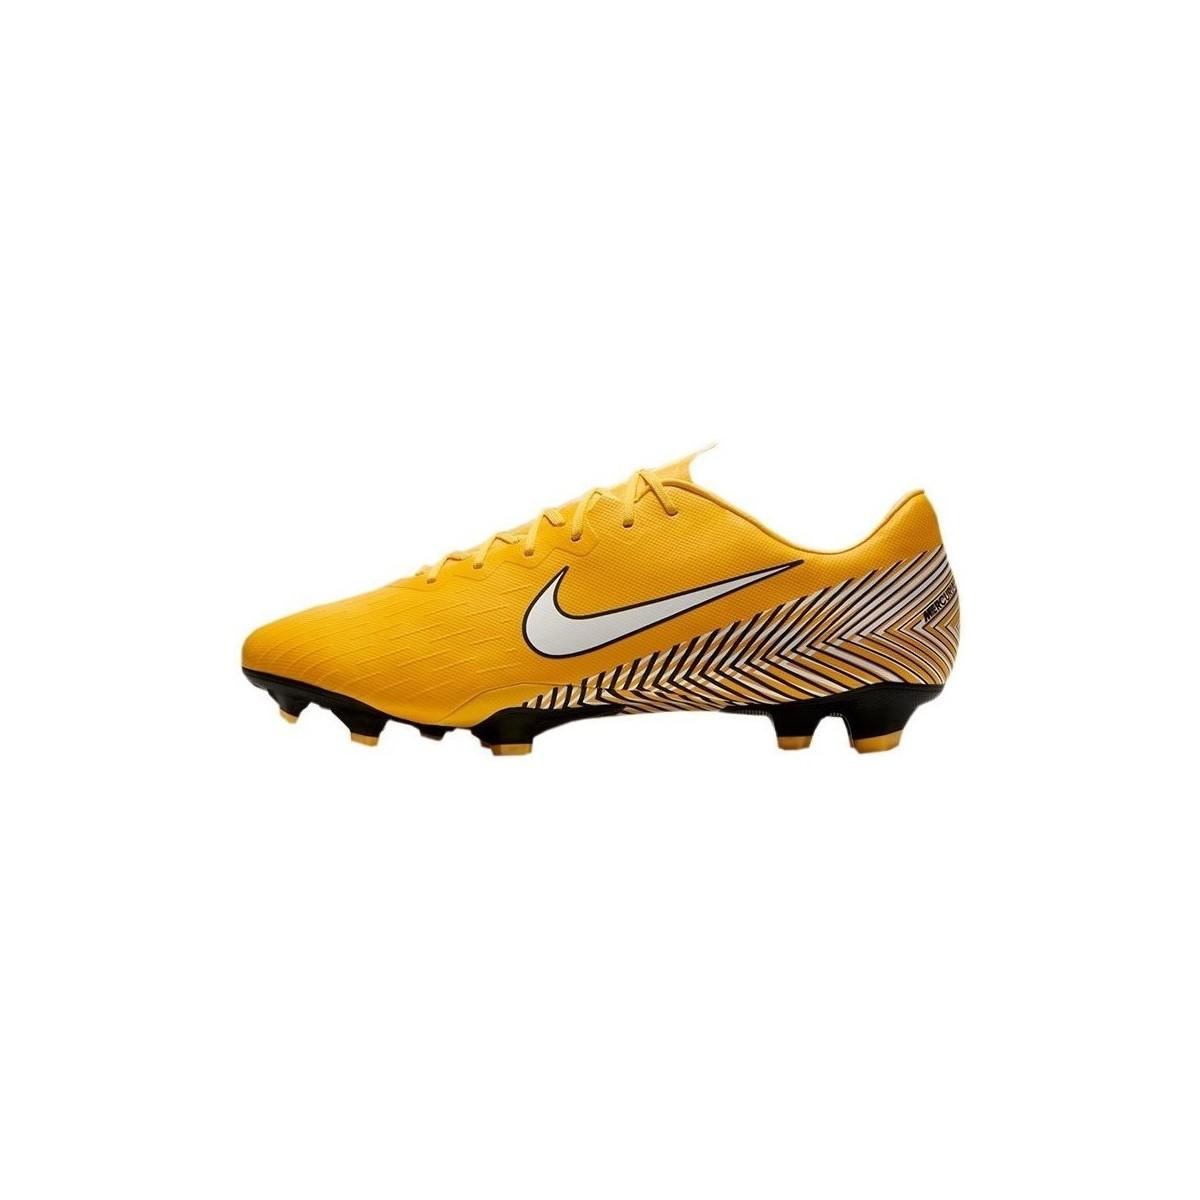 9122d75878ed Nike Neymar Vapor 12 Pro Fg Men's Football Boots In Yellow in Yellow ...